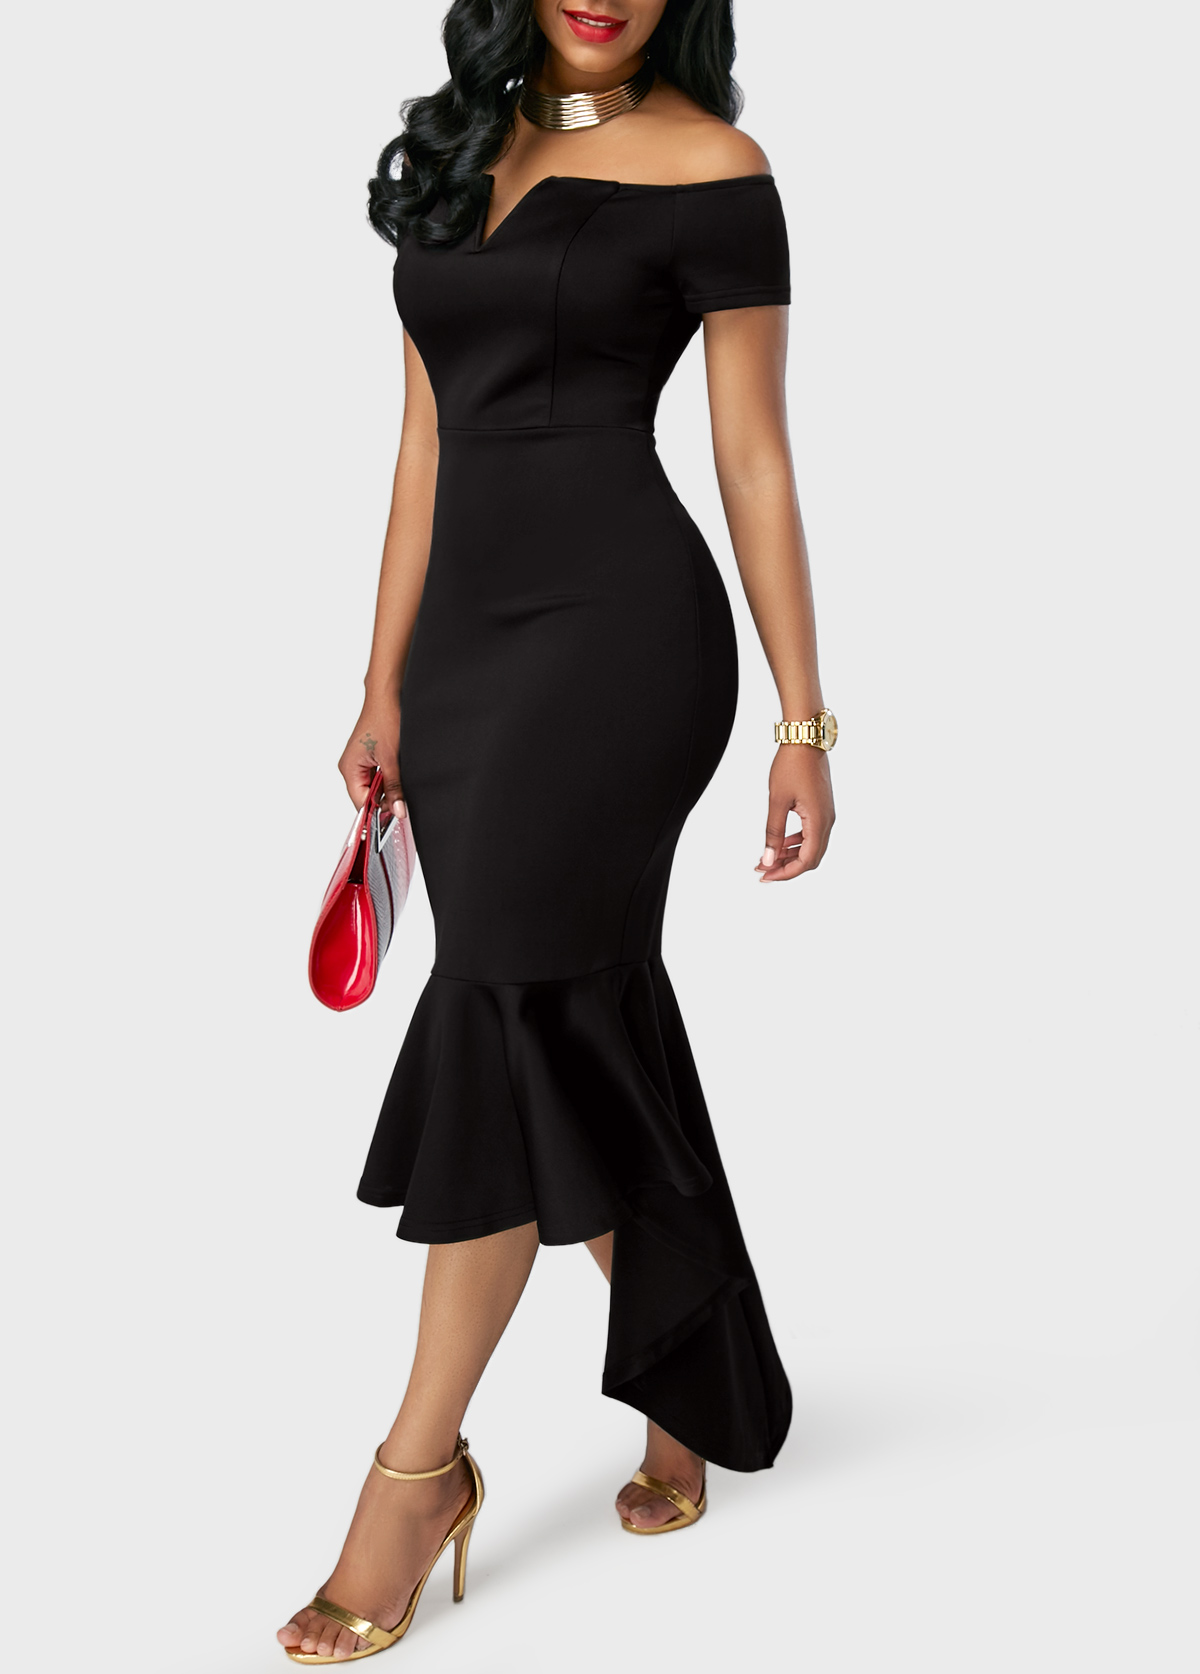 Little black dress on becky g